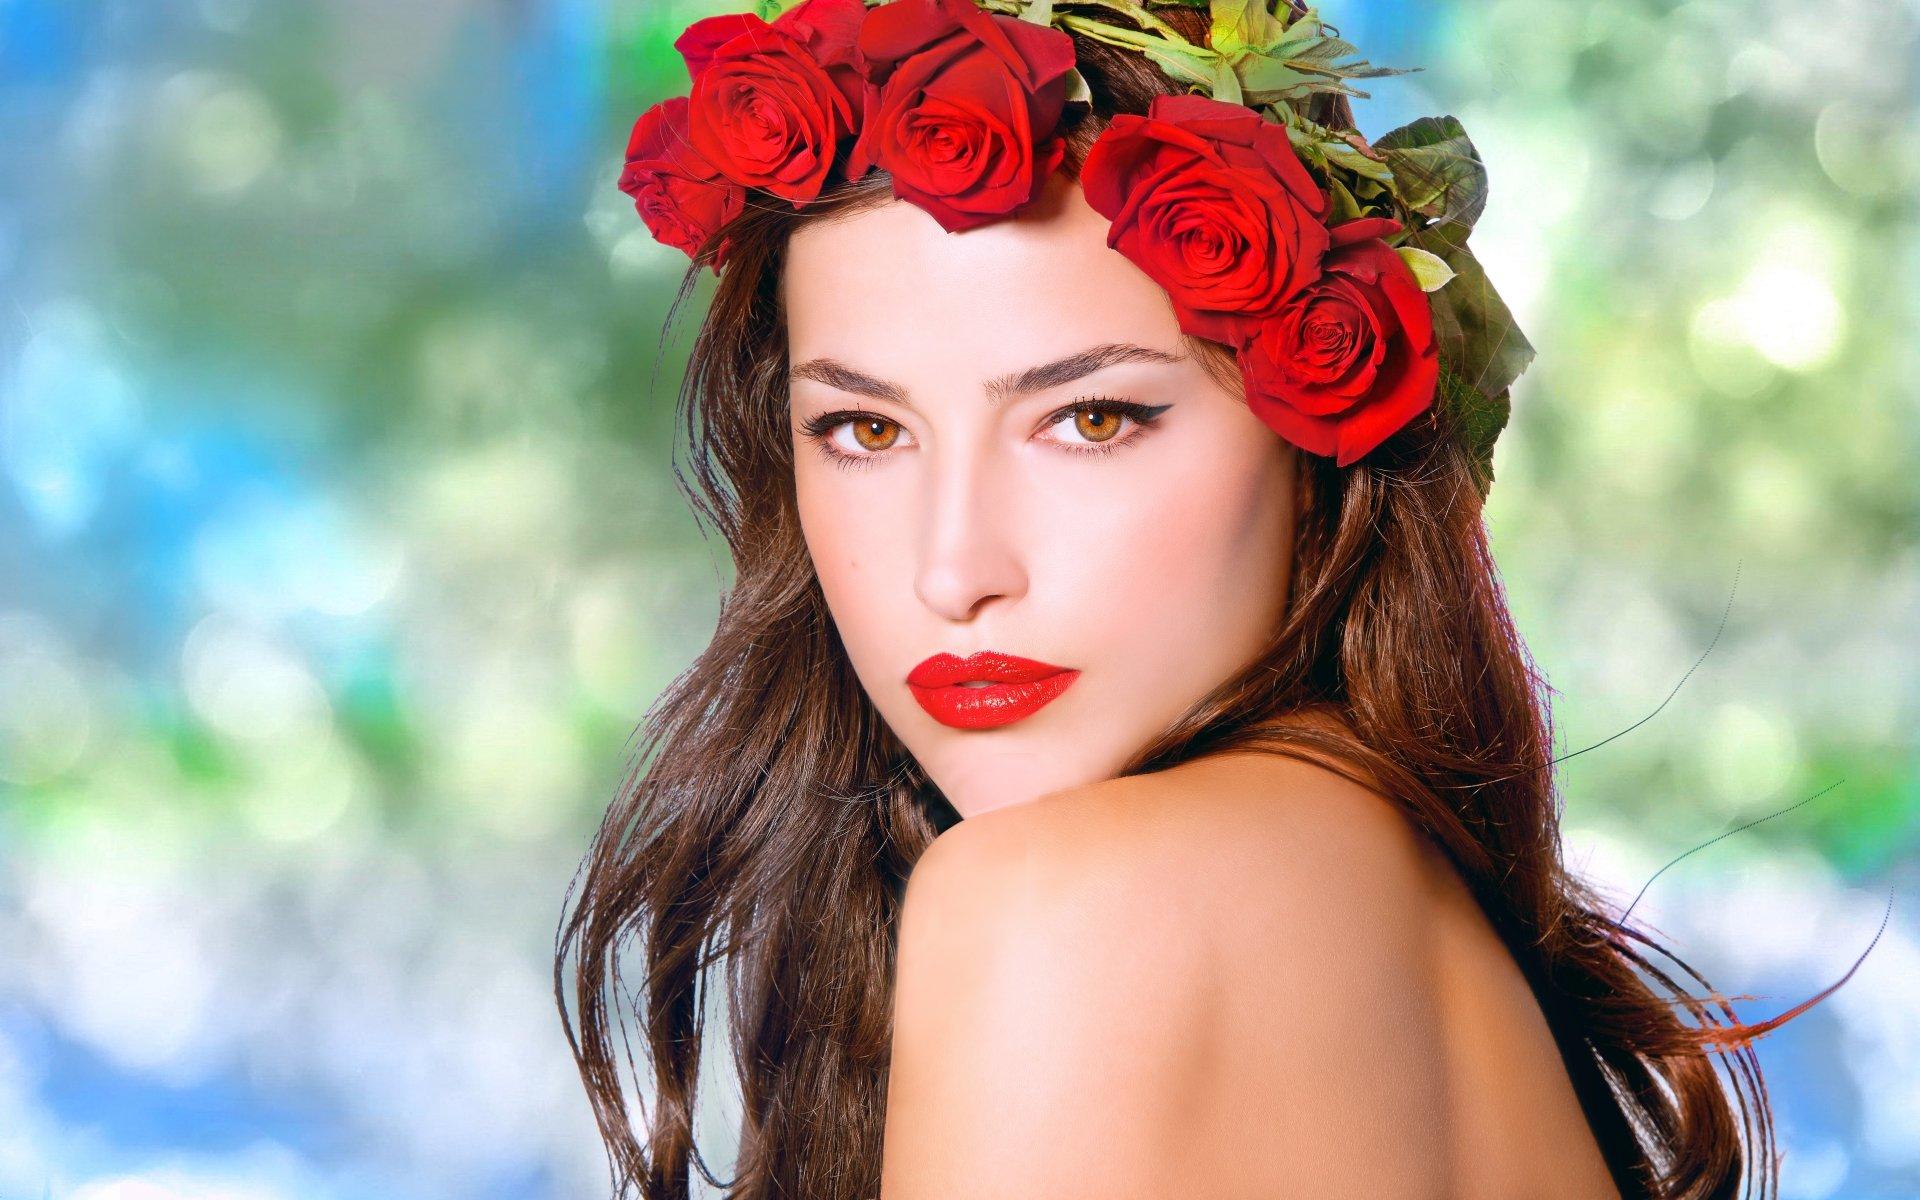 Women - Beautiful  Colorful Face Rose Model Wallpaper